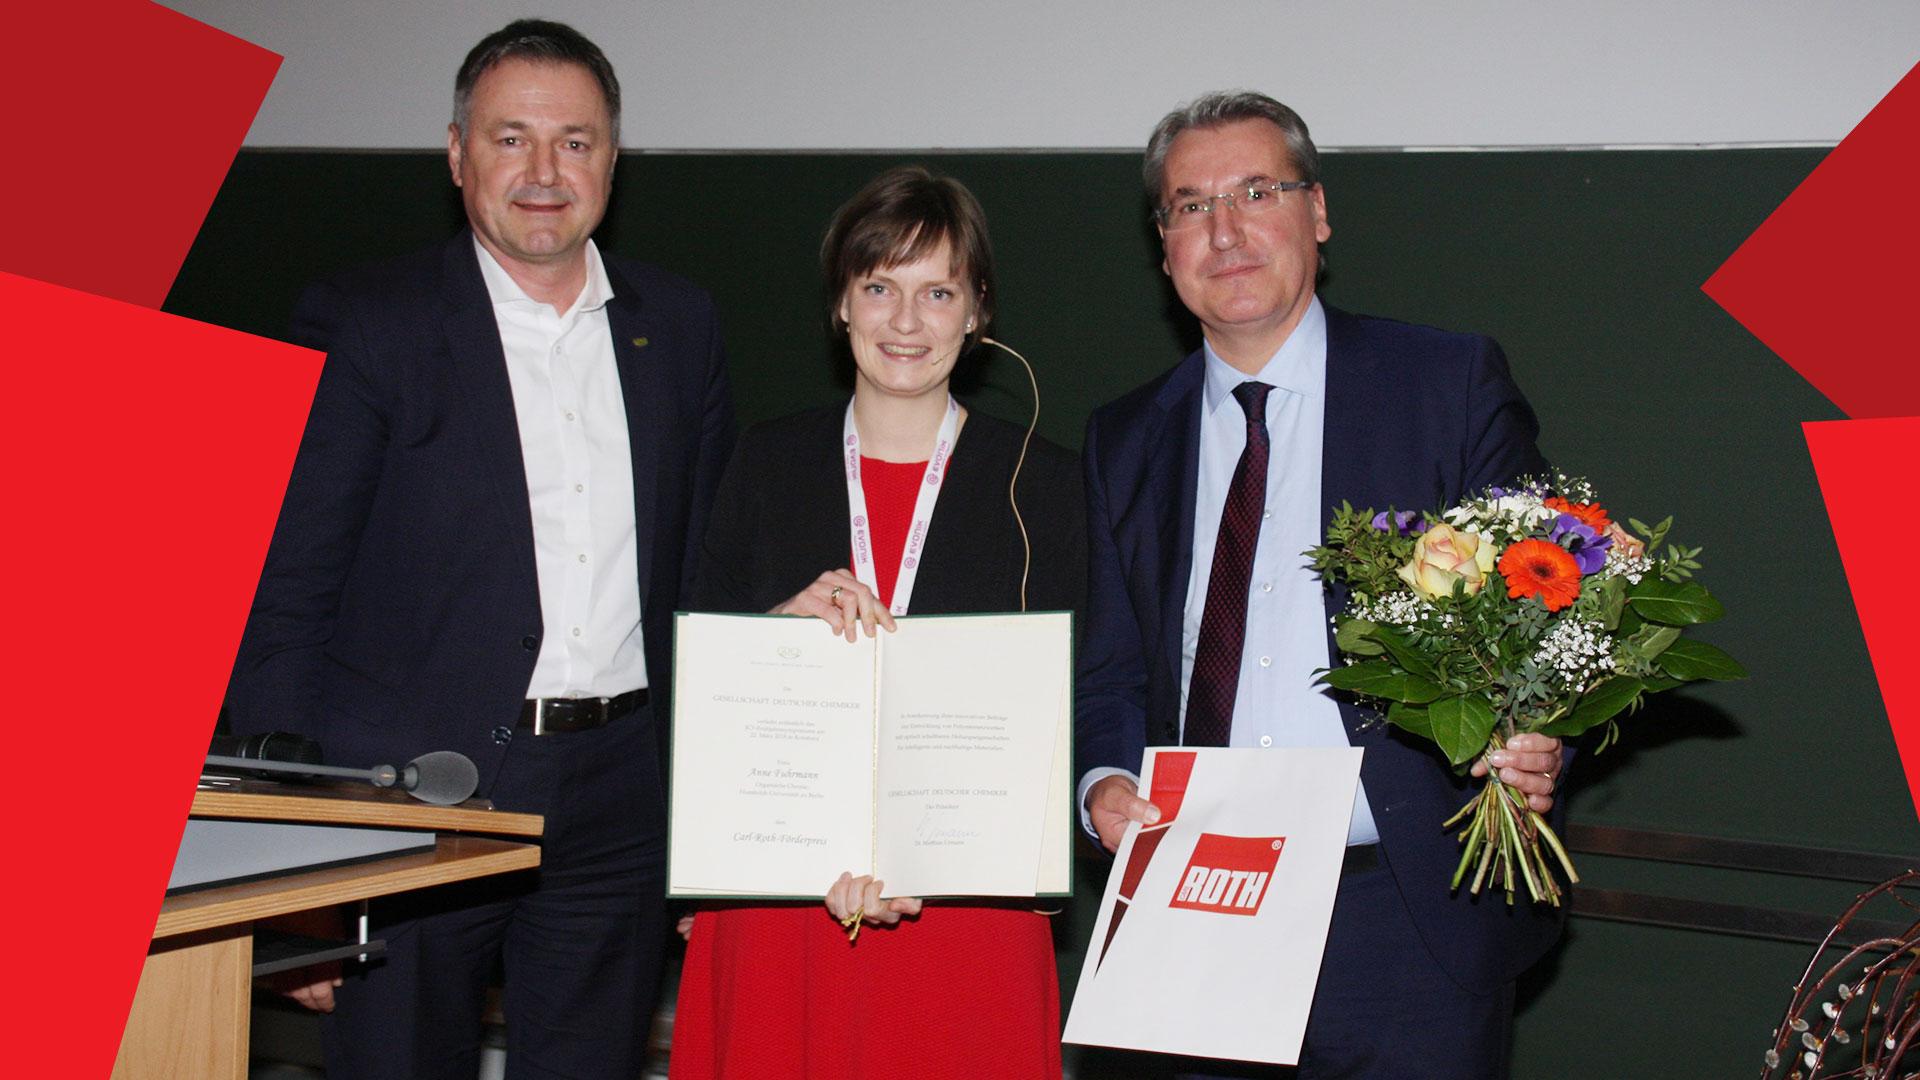 Carl Roth Förderpreis